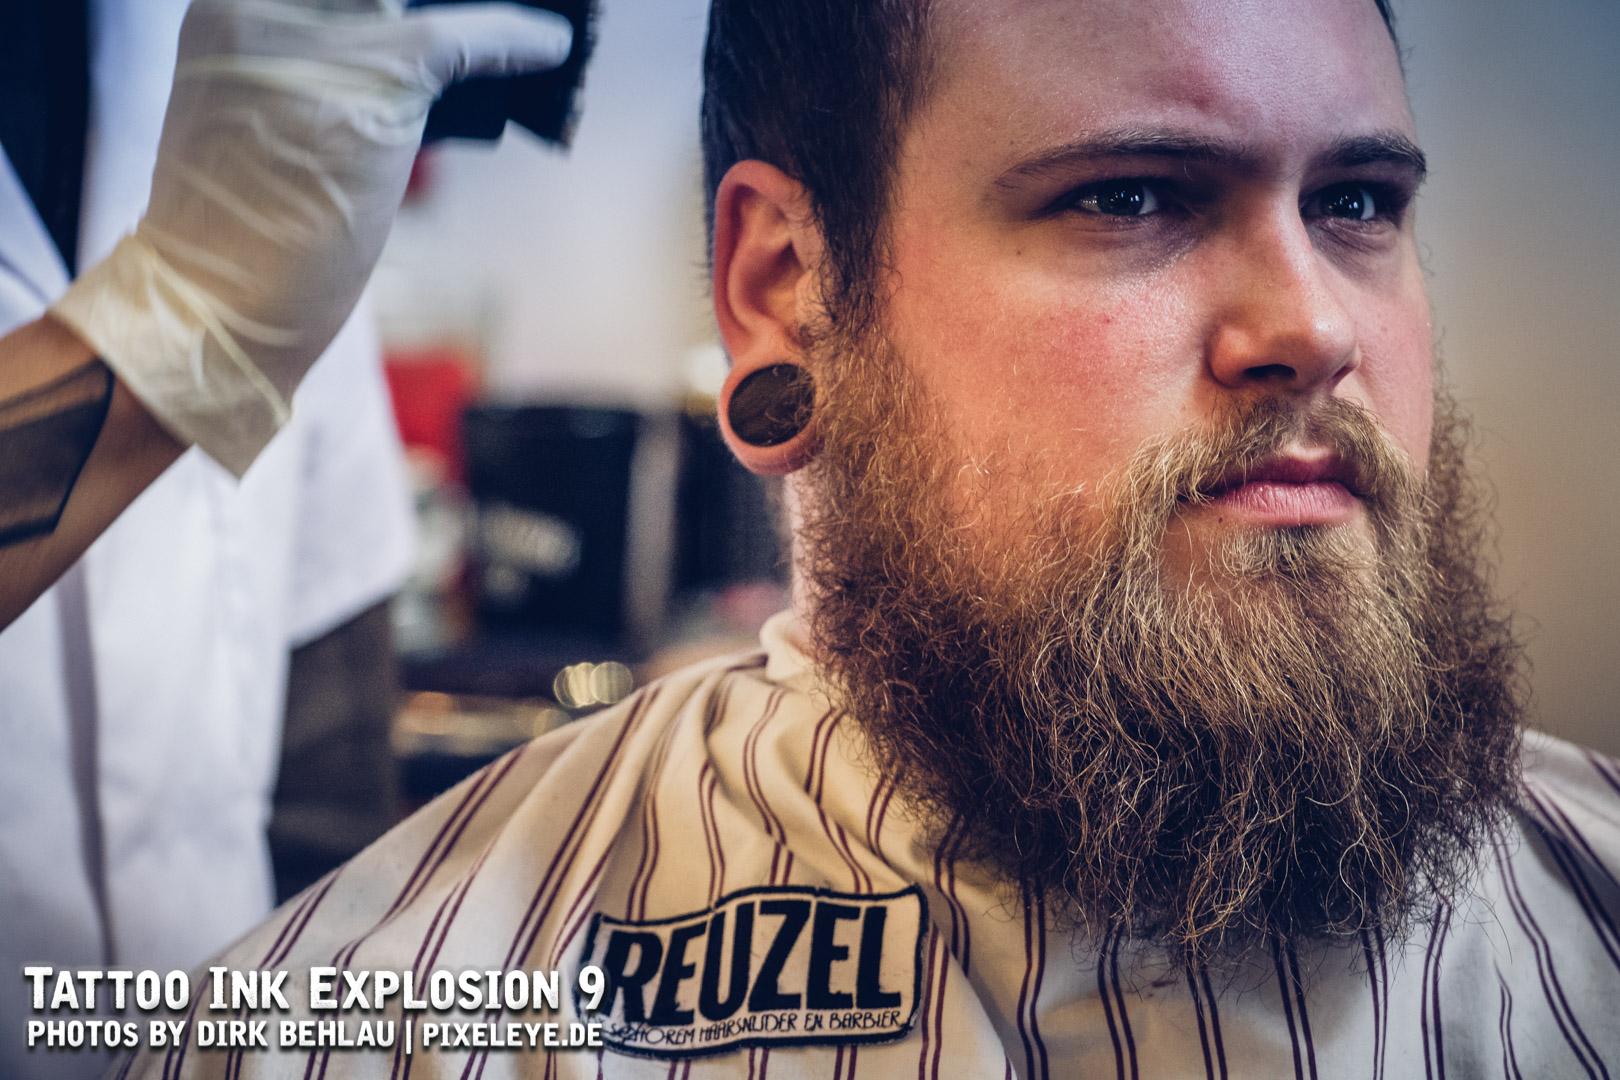 Tattoo Ink Explosion 2018 WEB by Dirk Behlau-1338.jpg